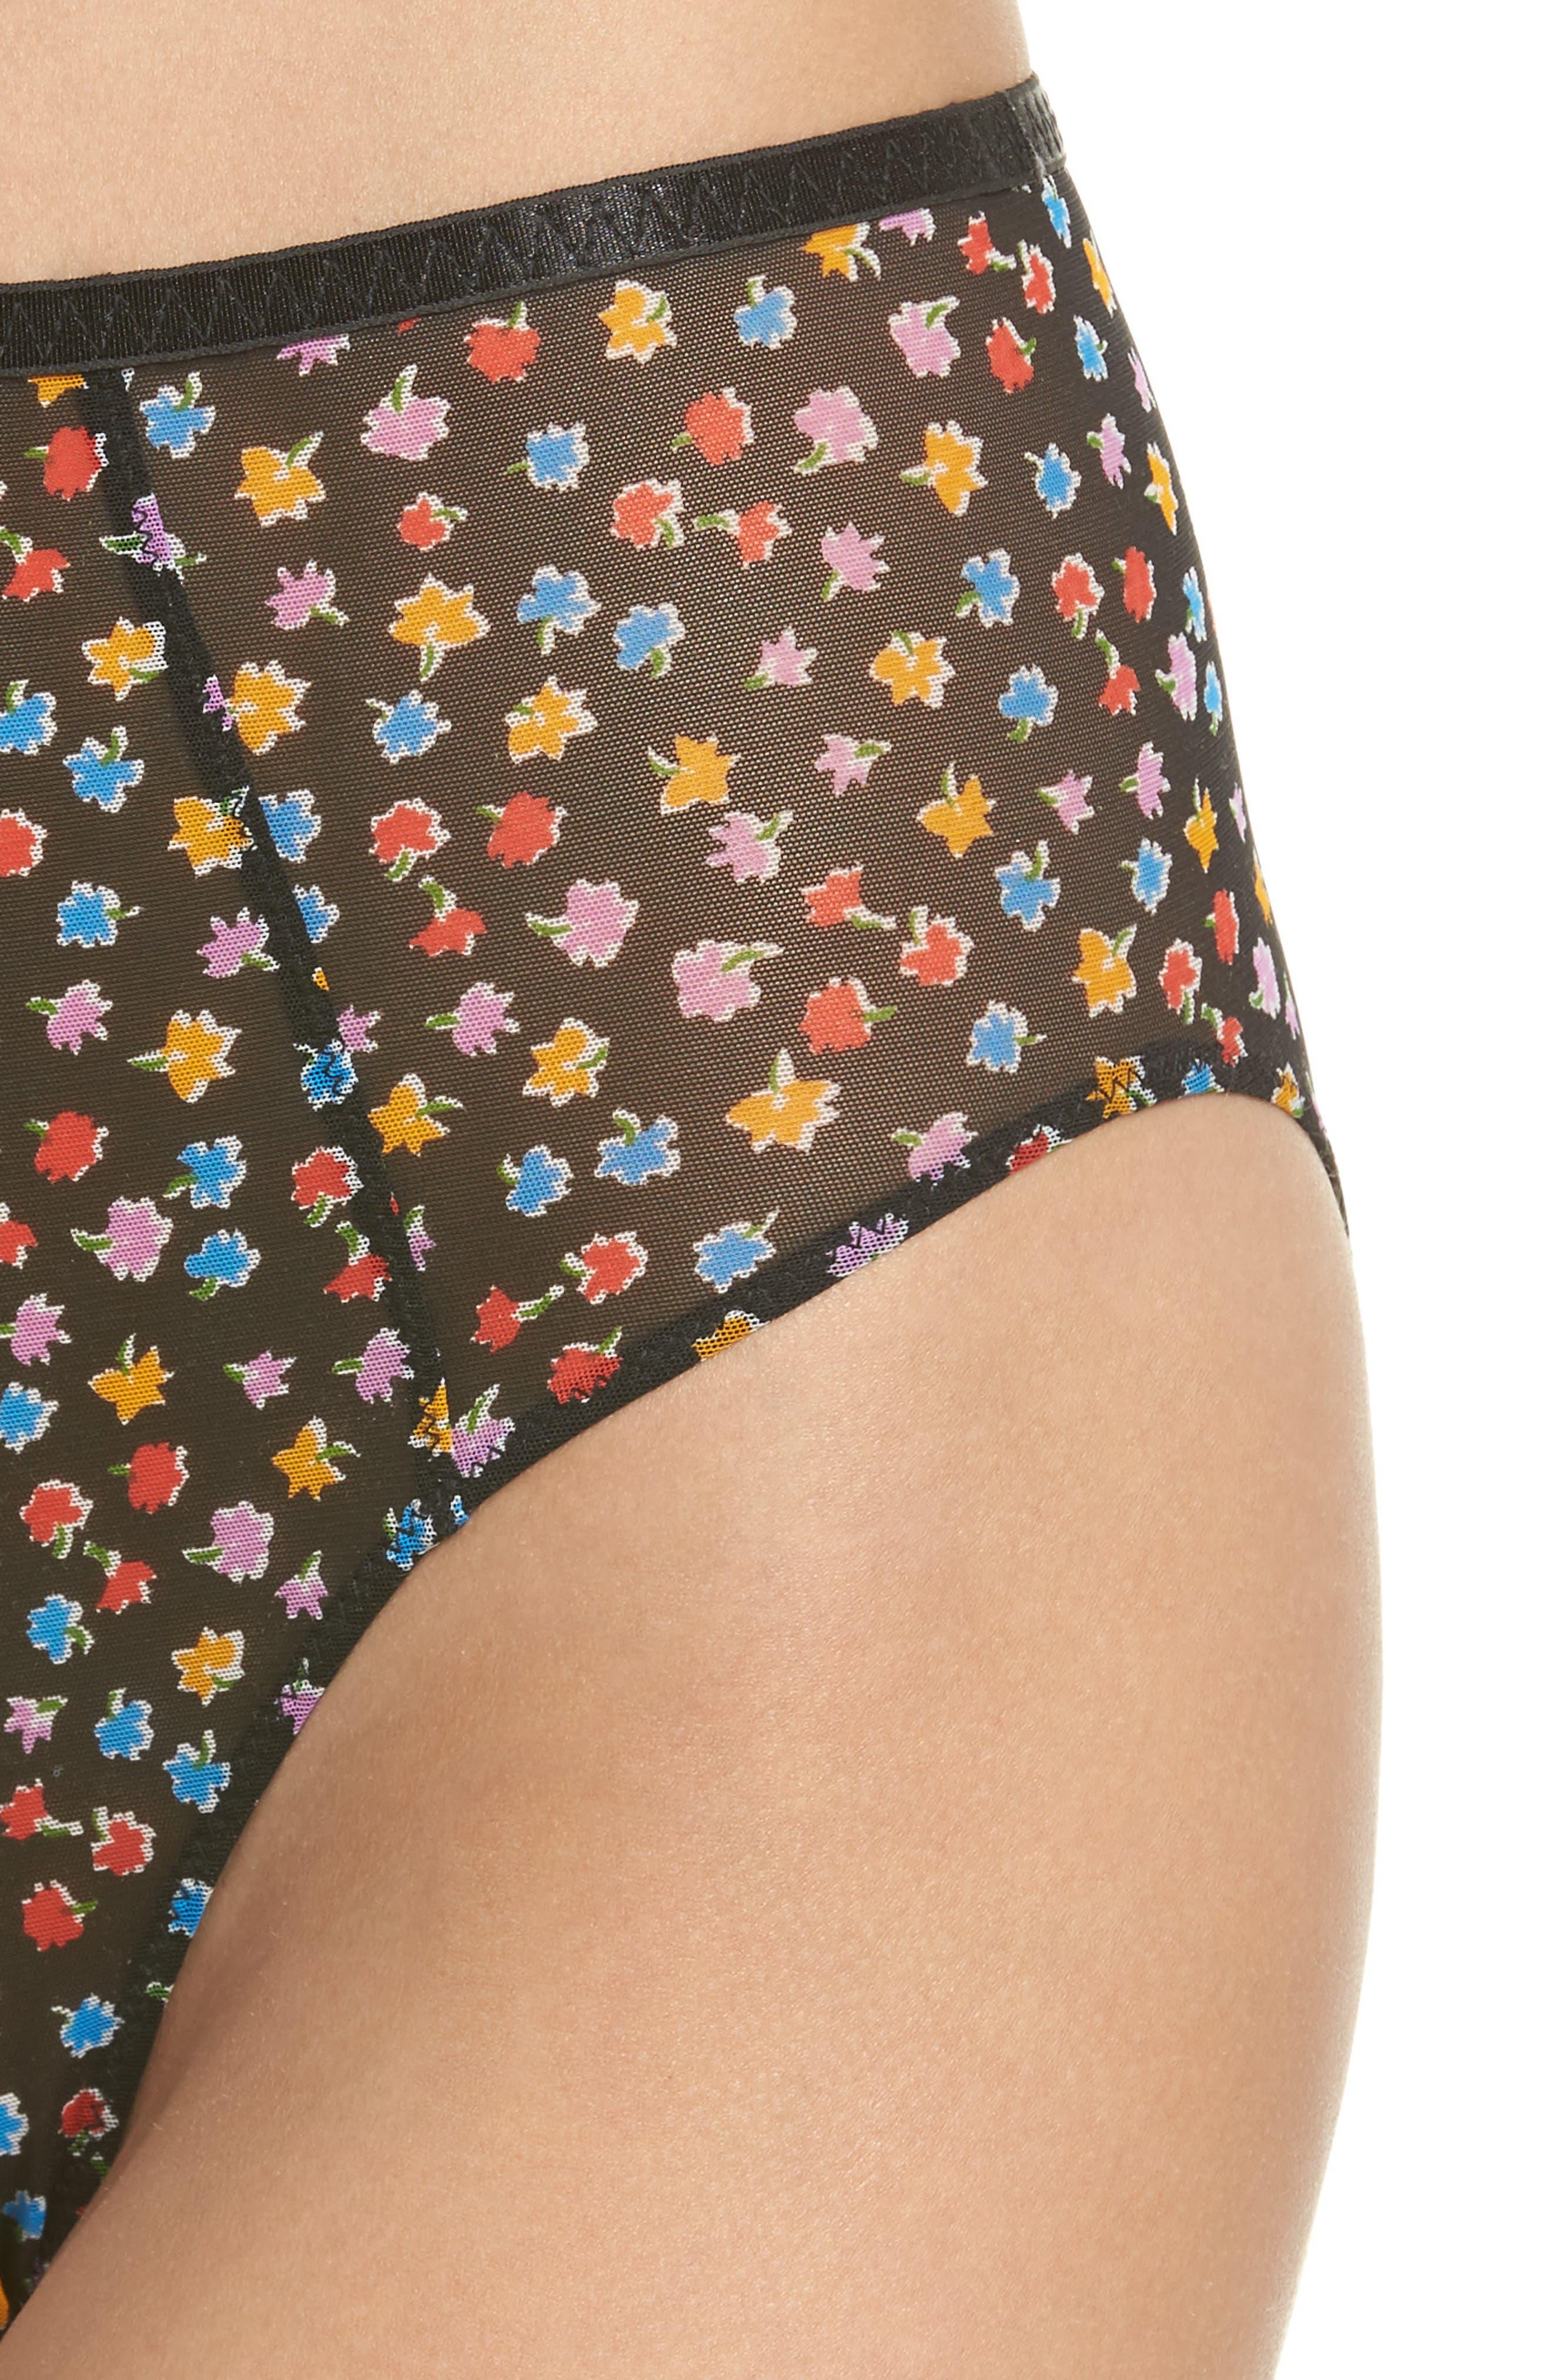 Intimately FP Capri High Waist Panties,                             Alternate thumbnail 4, color,                             019